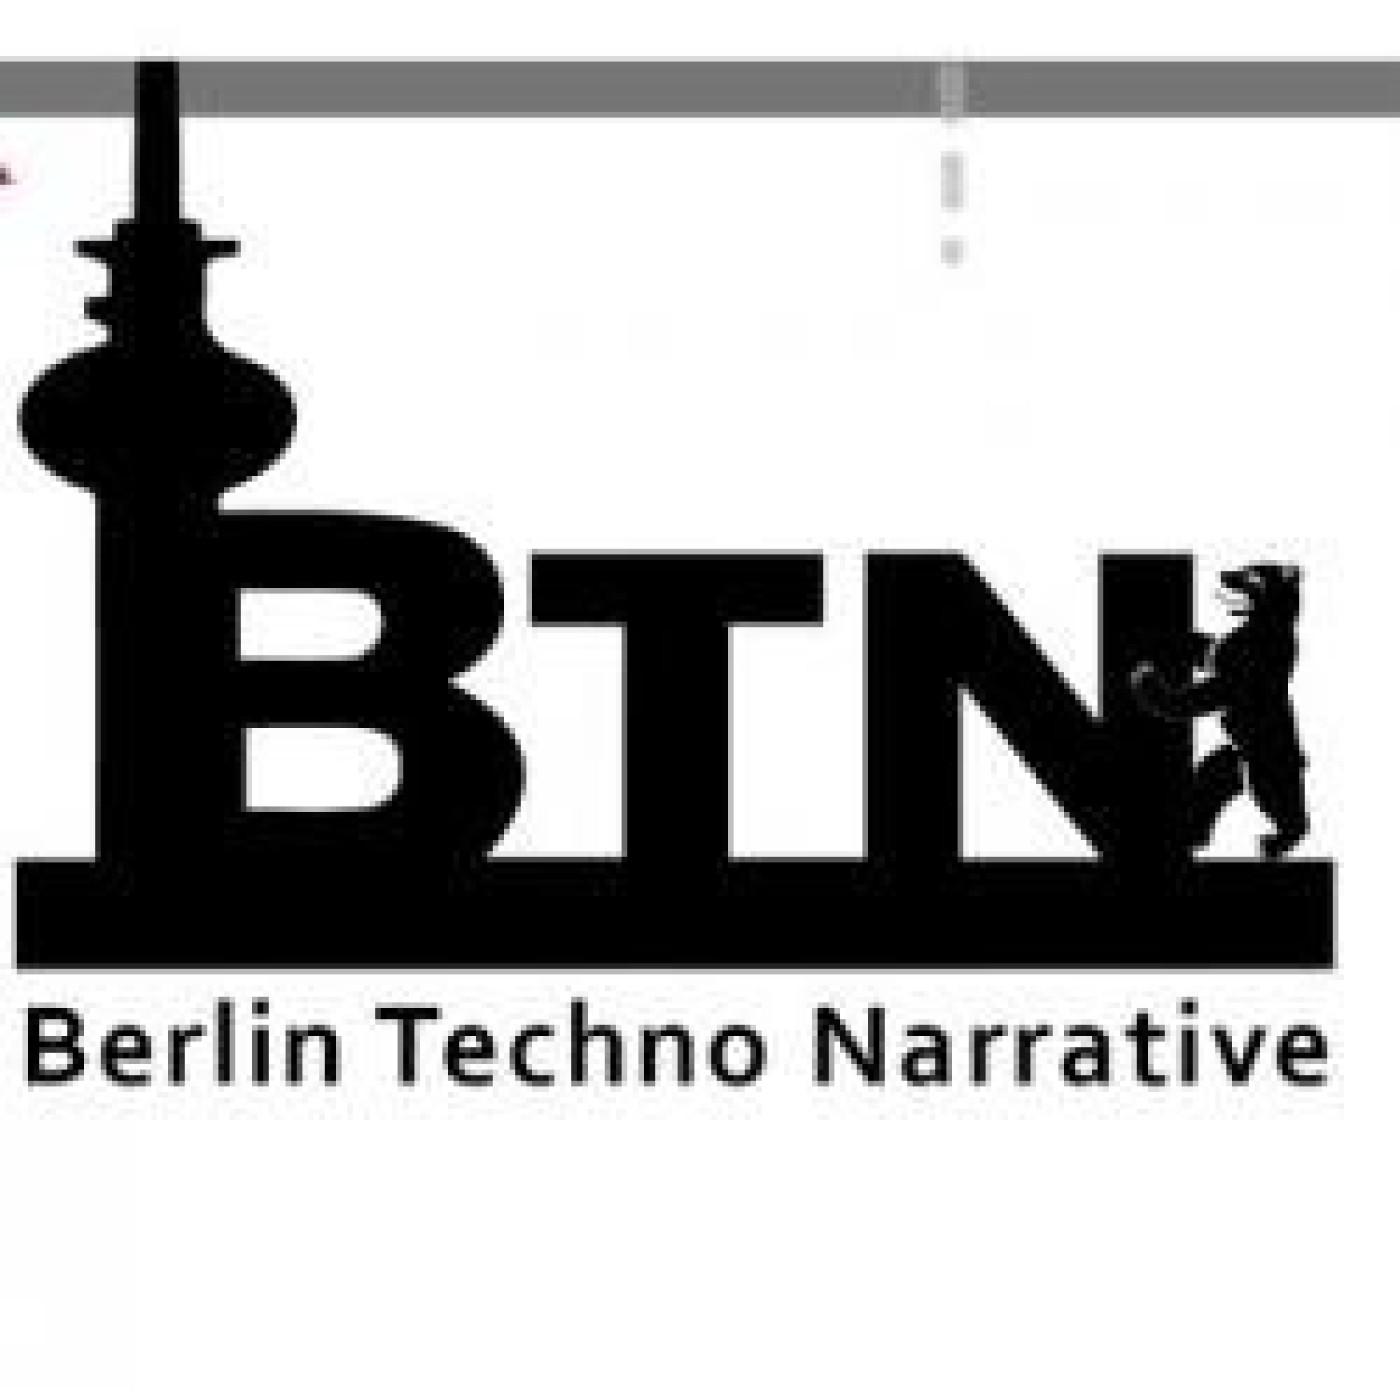 PANORAMAXX : BERLIN TECHNO NARRATIVE